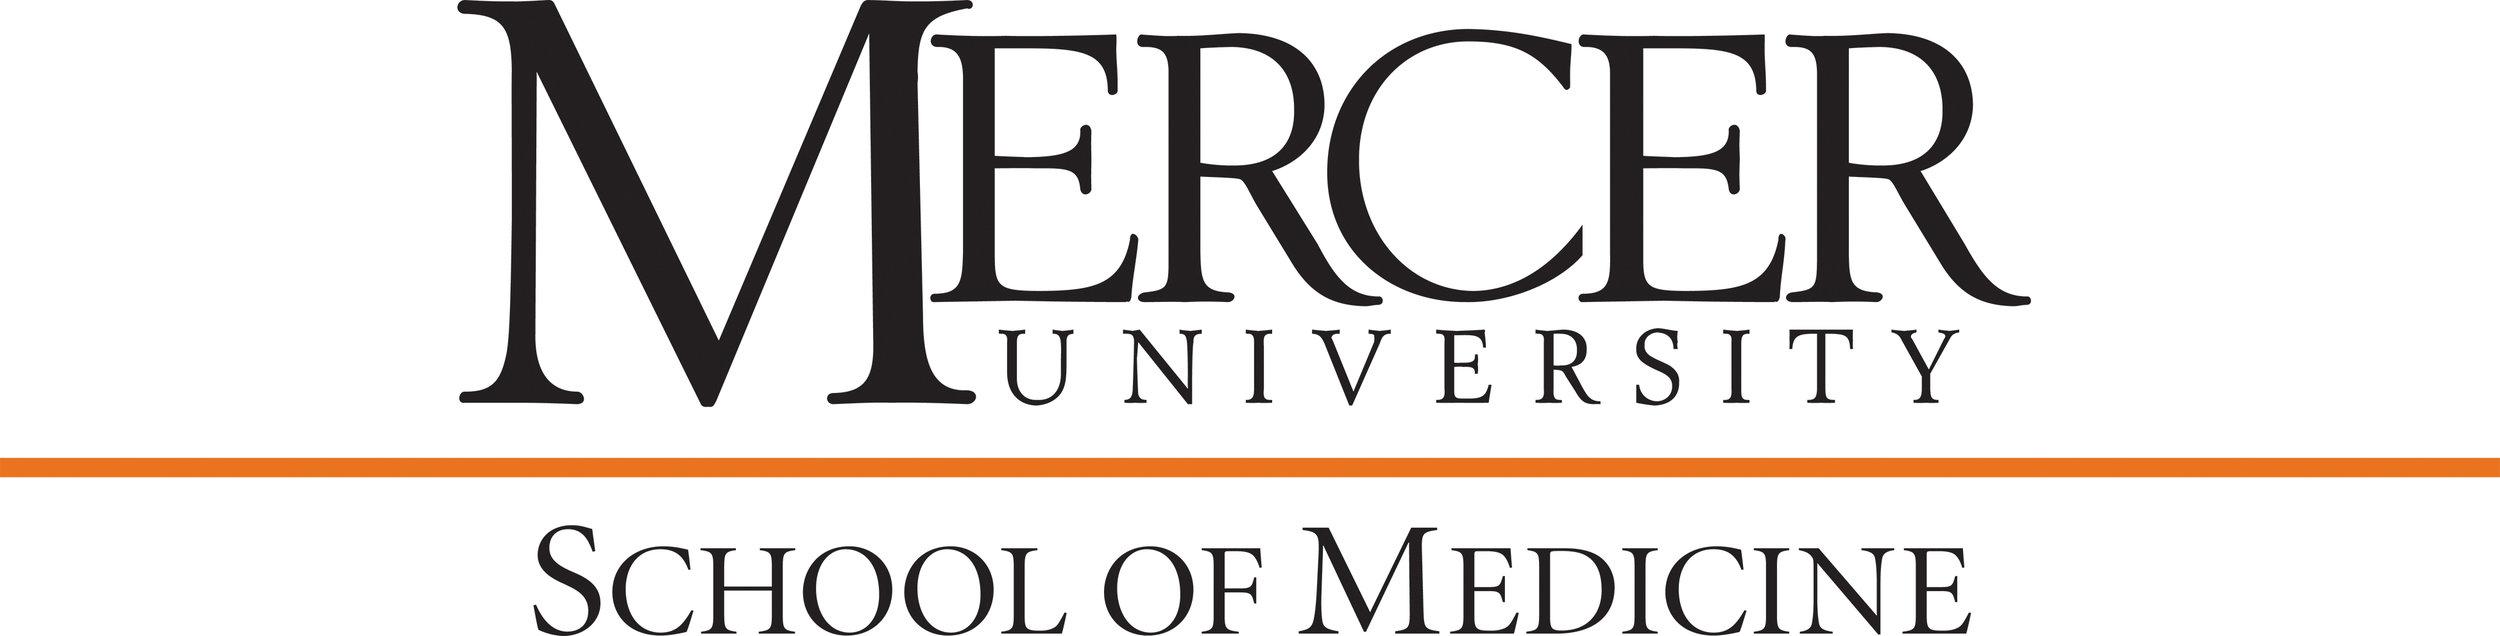 Mercer University School of Medicine - Department of Psychiatry and Behavioral Sciences